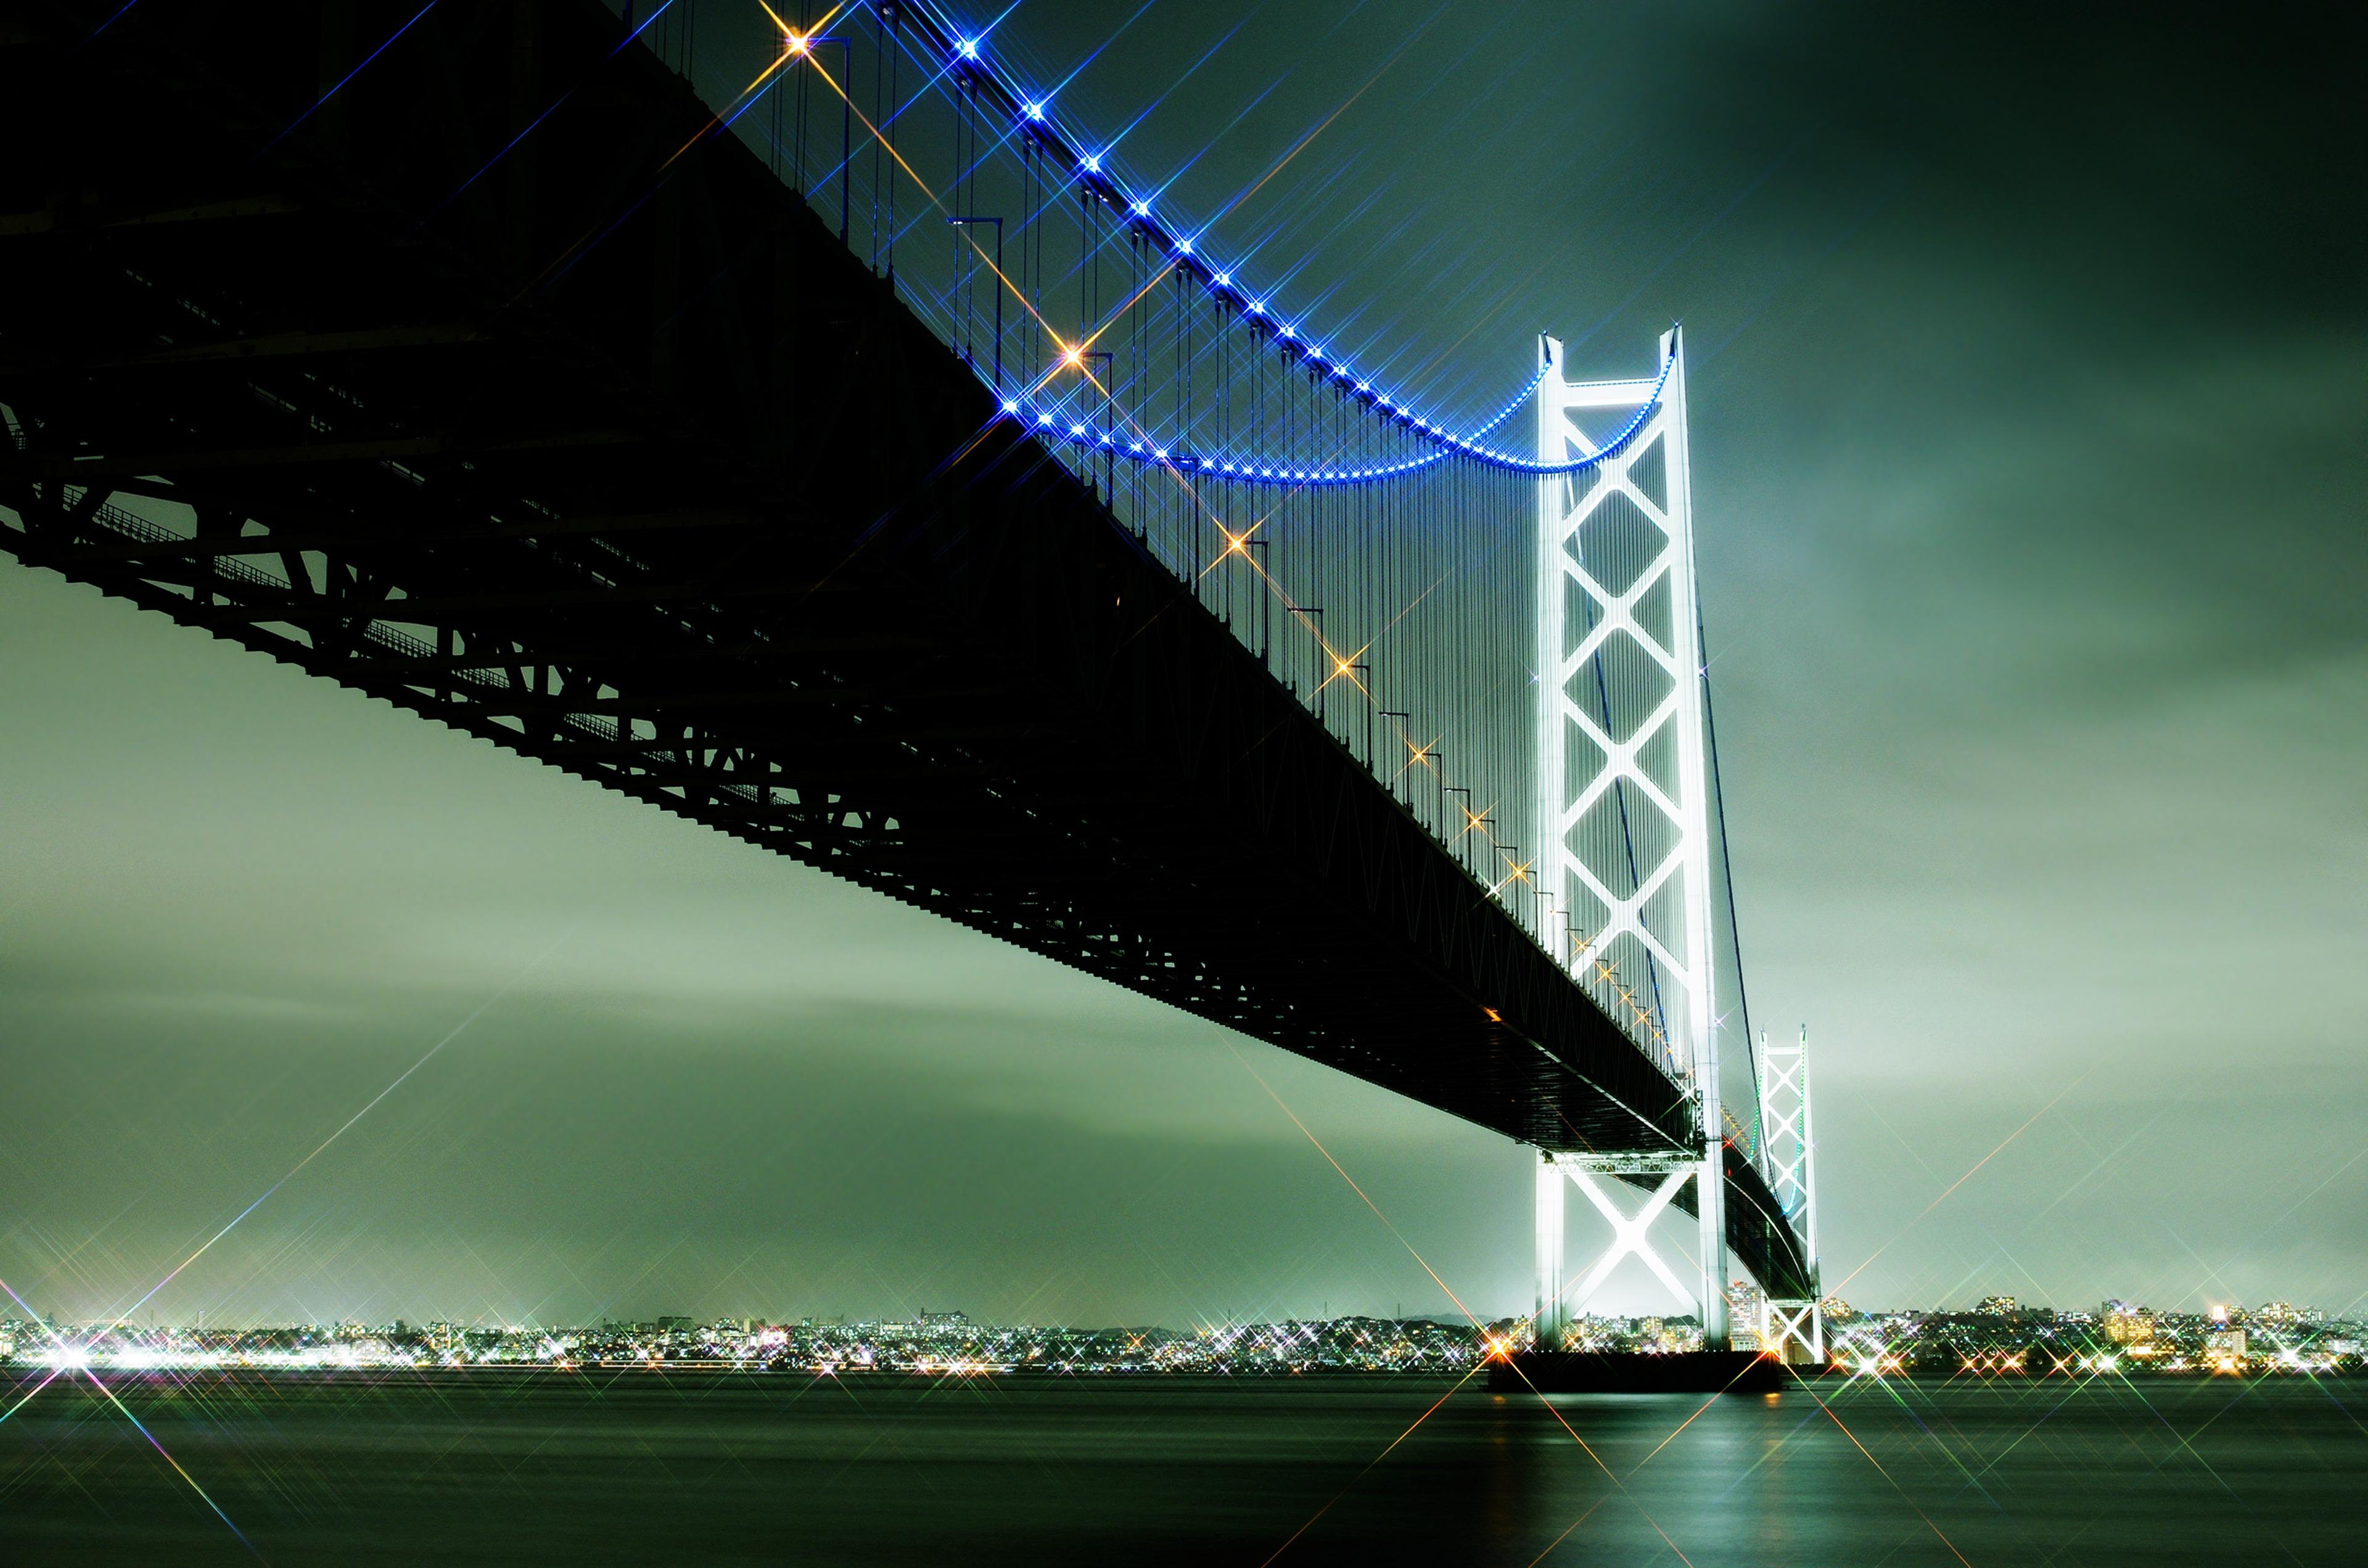 Akashi Kaikyo Bridge: Bridge, Light, Night, Japan, Sea, City, Akashi Kaikyō Bridge, Kobe